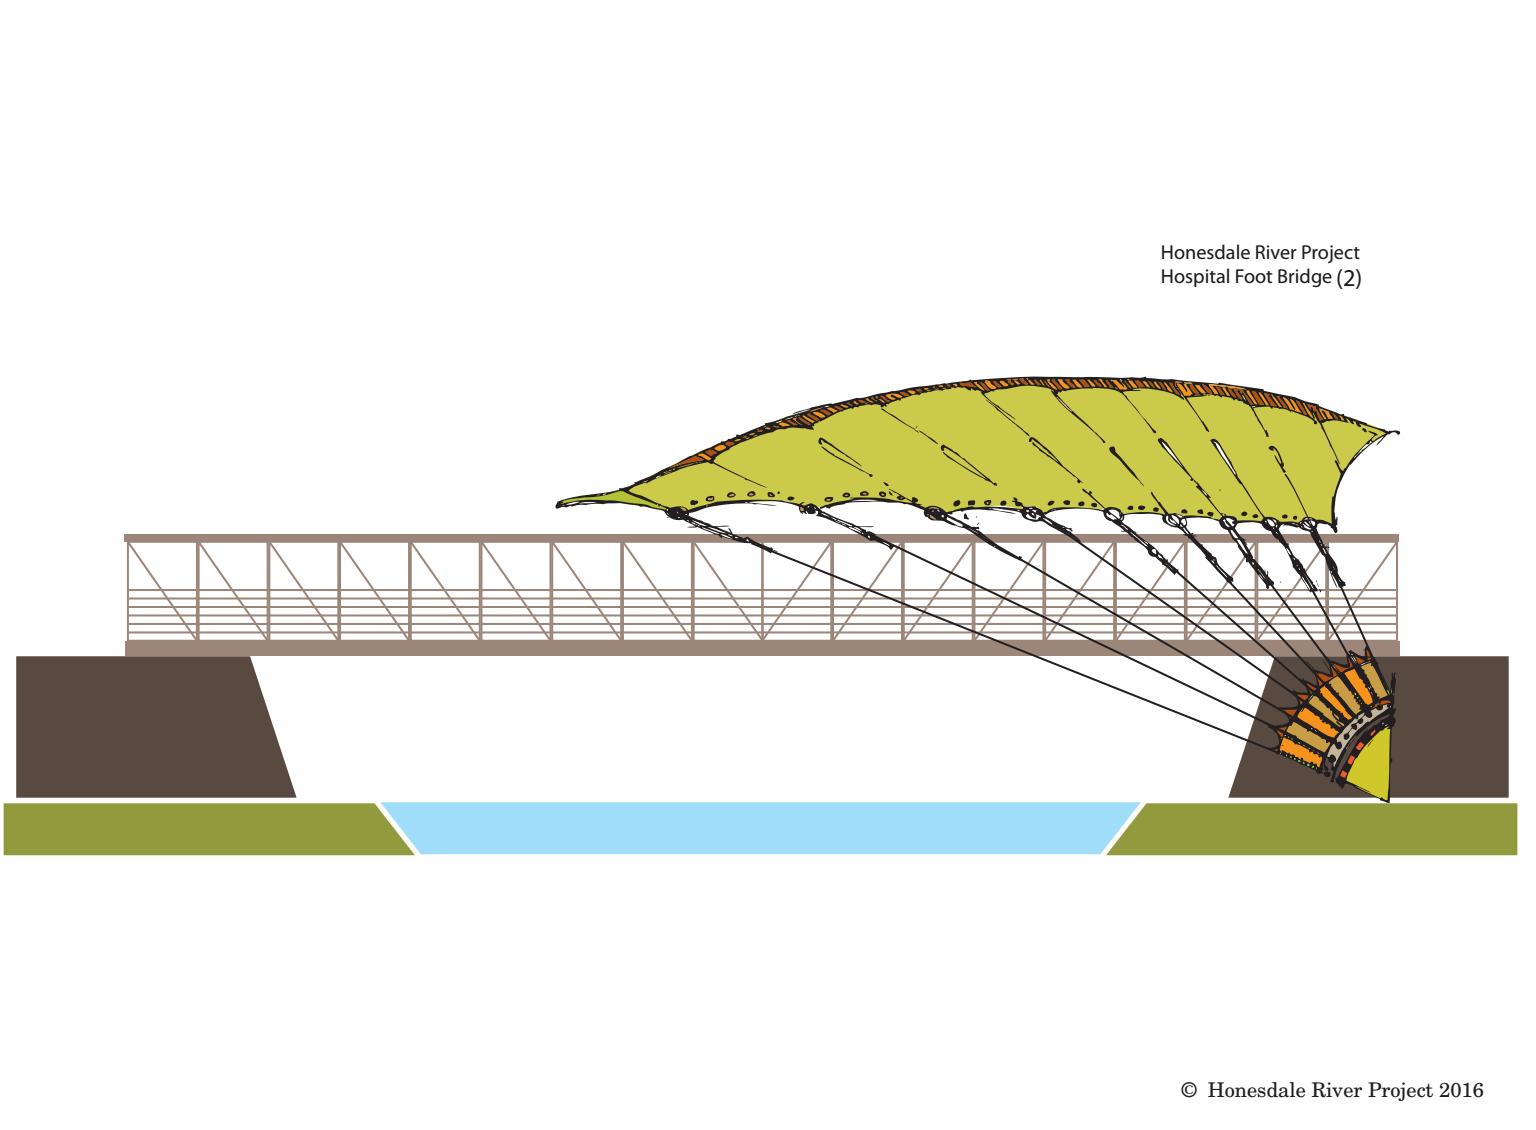 footbridge-hrp-2.png